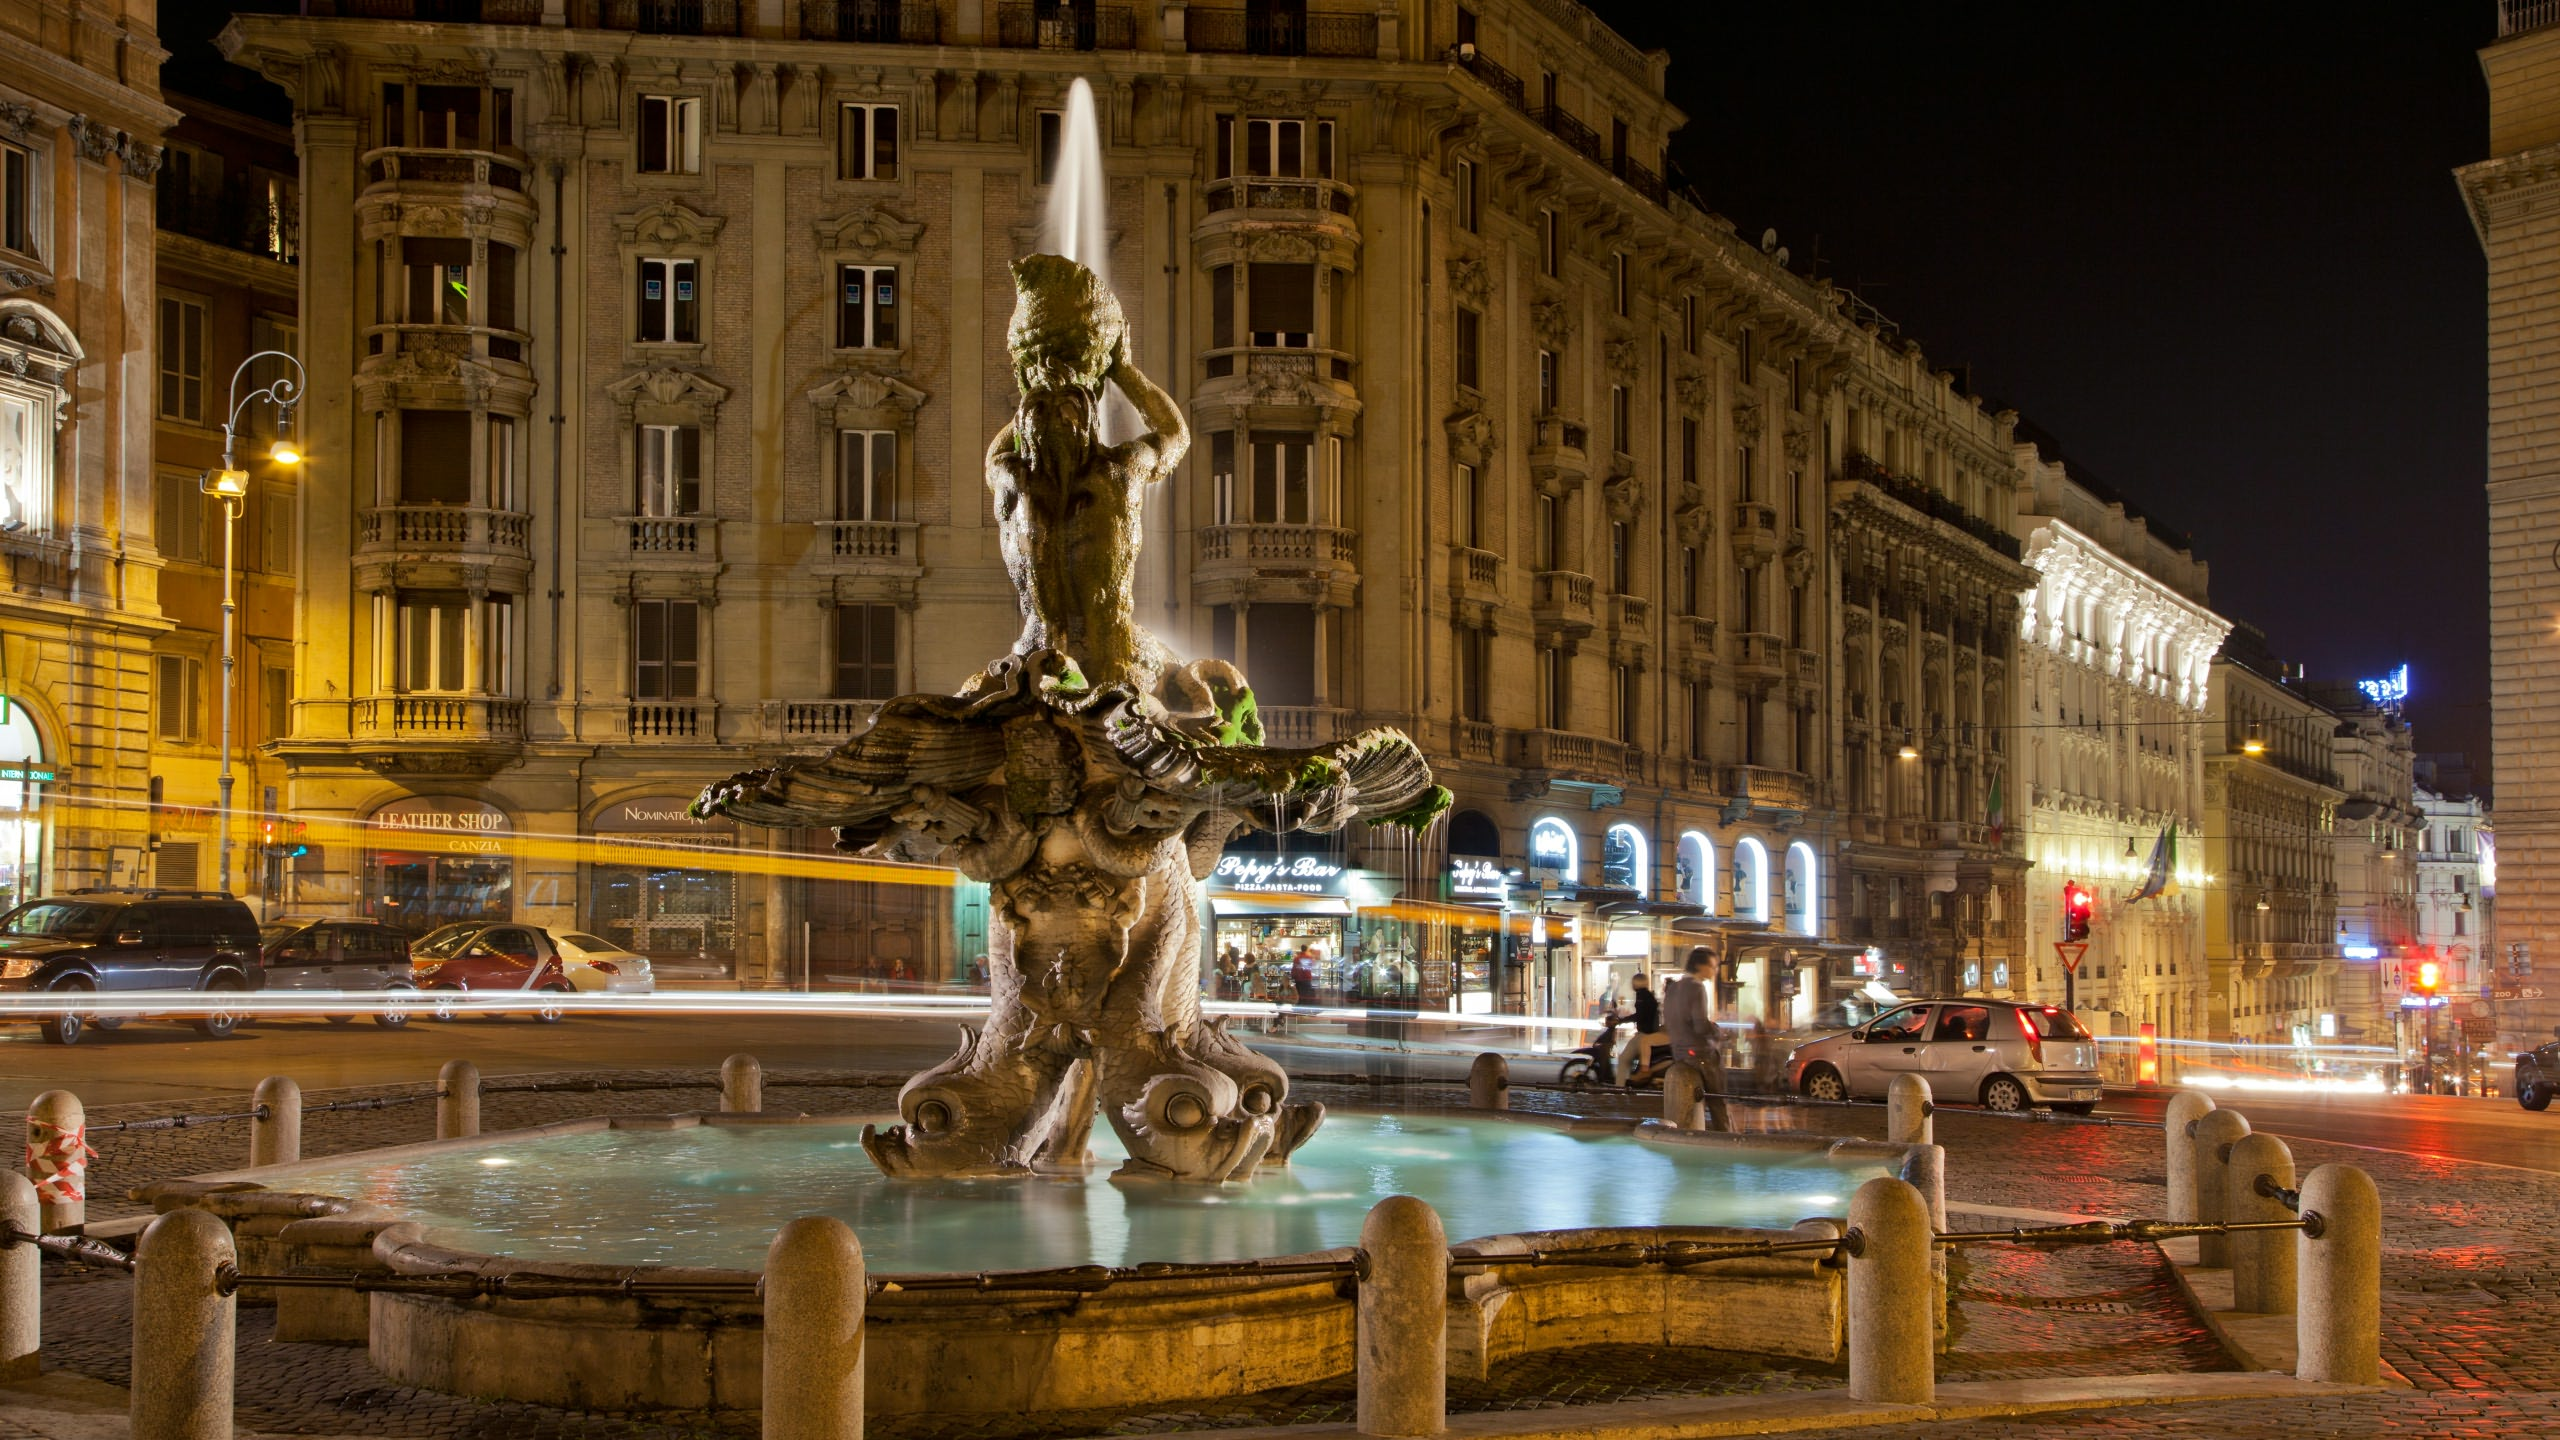 albergo-ottocento-rome-externe-05